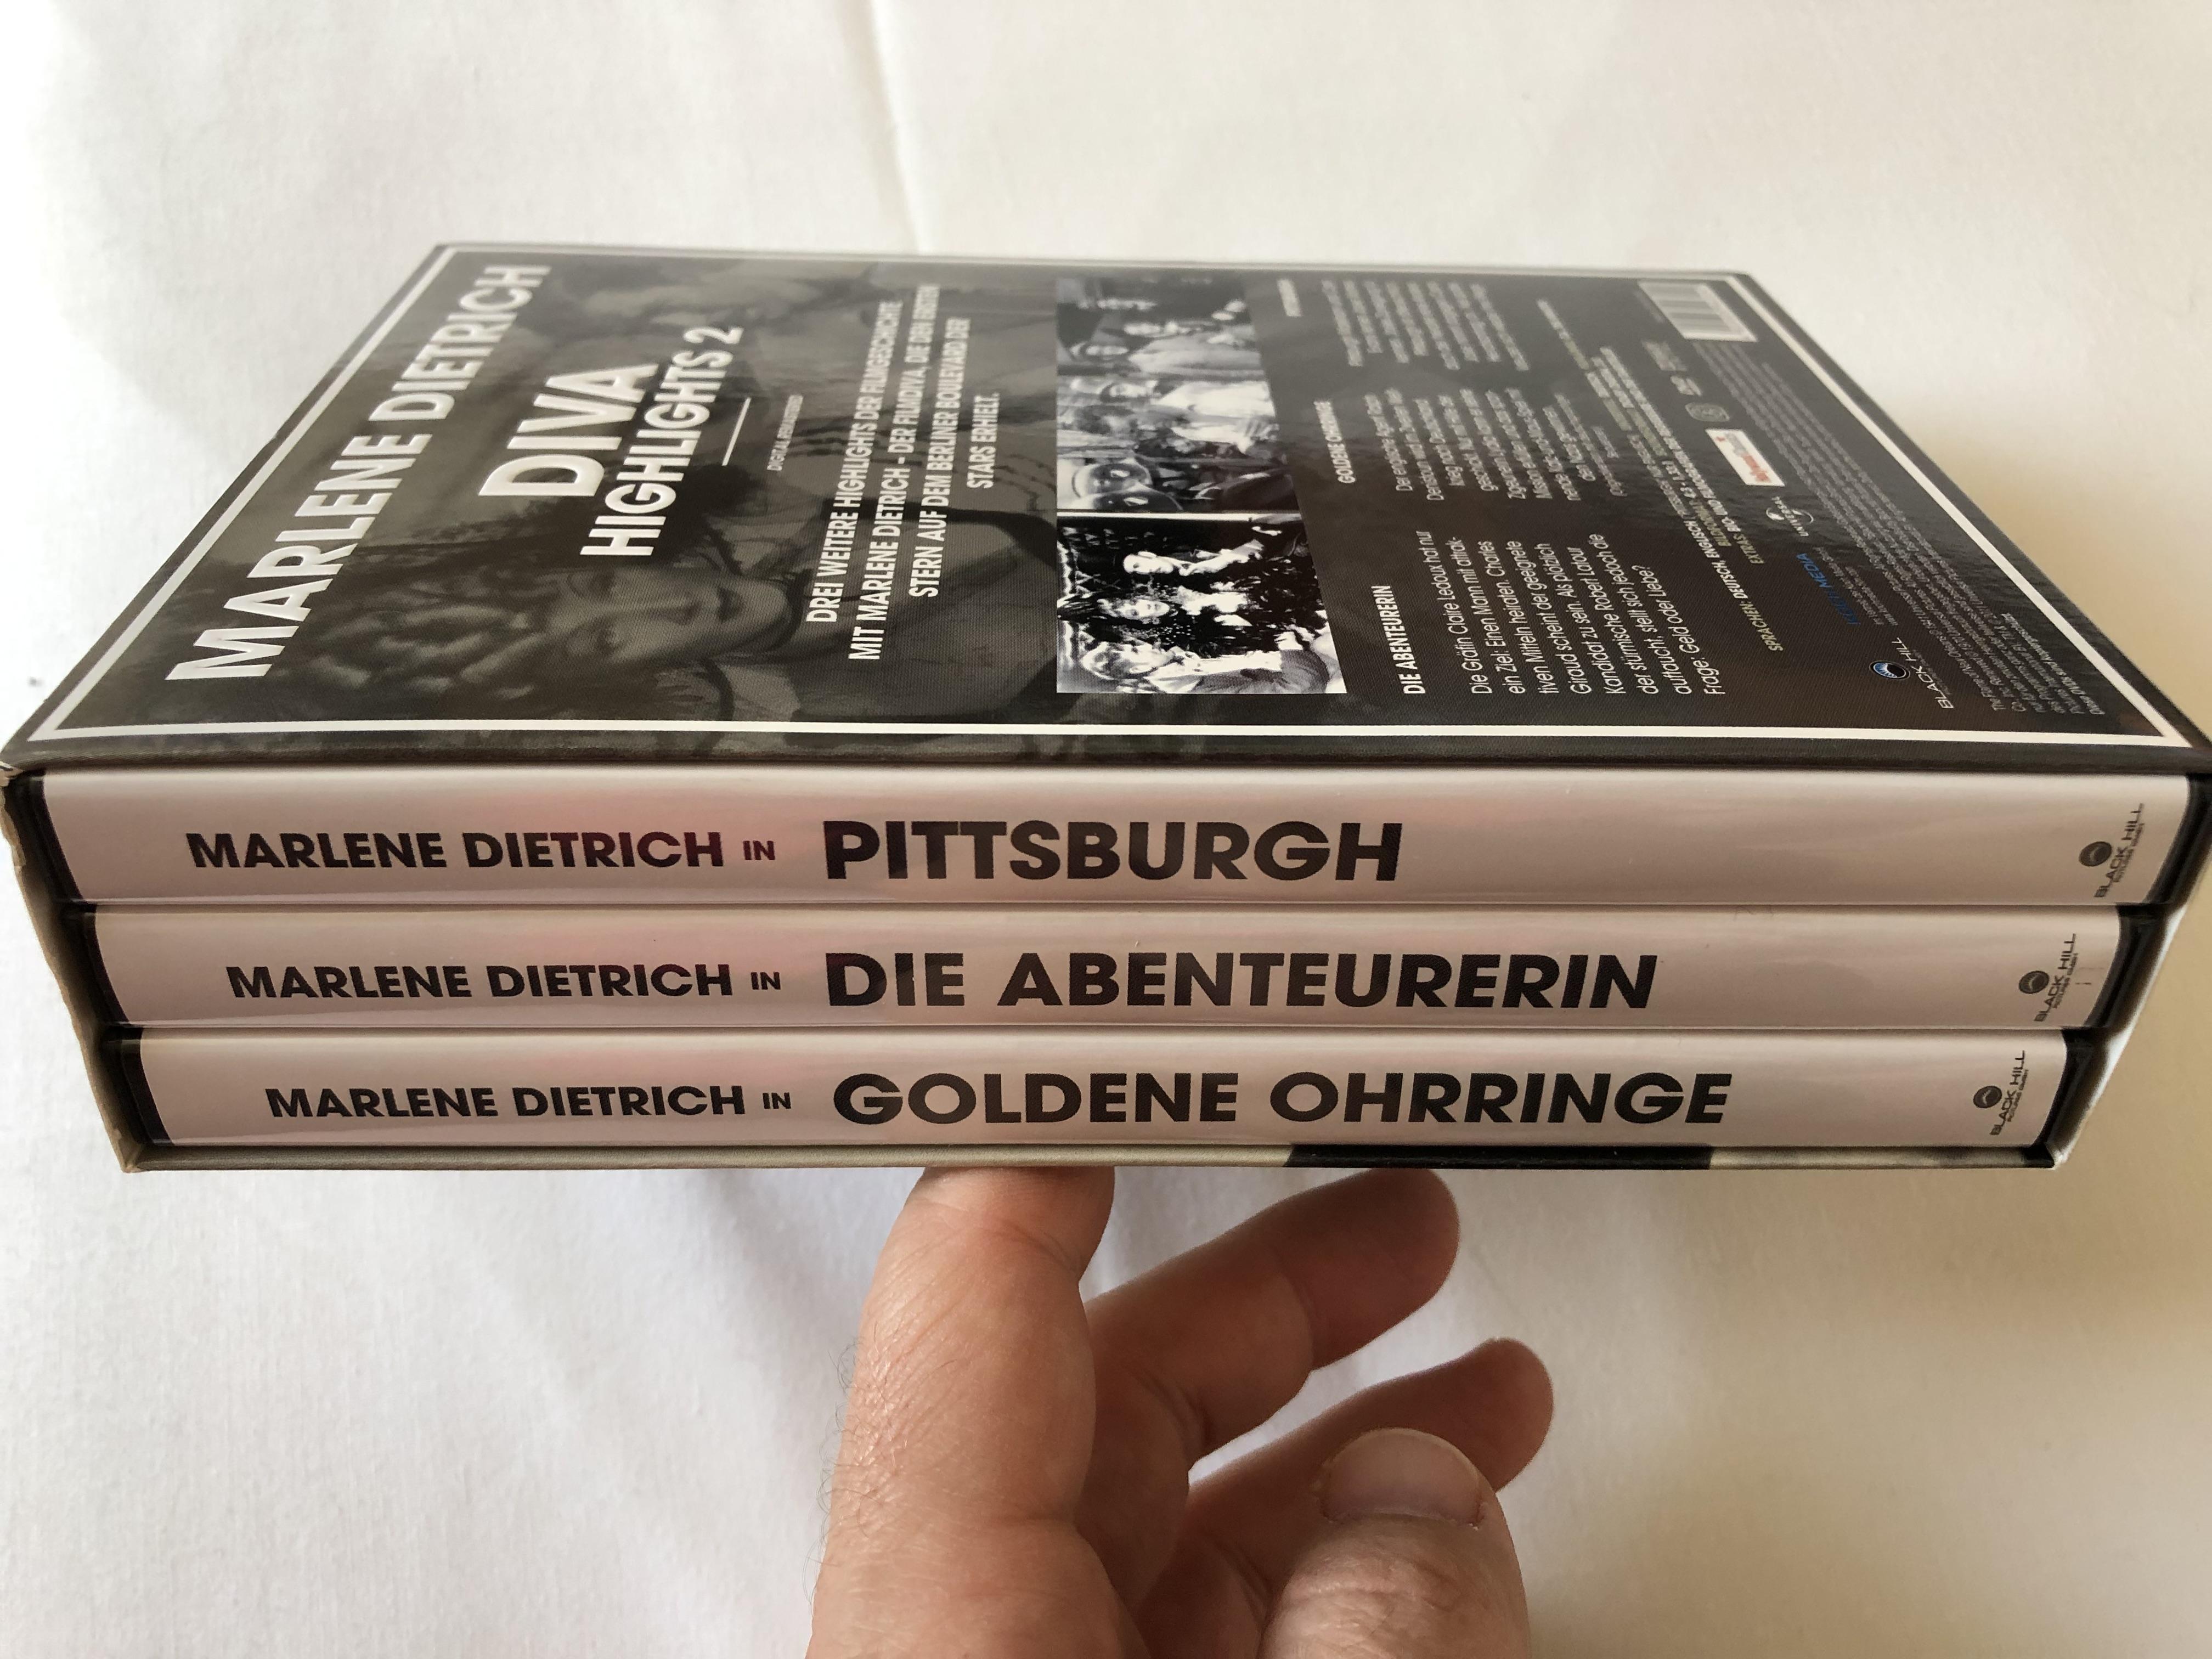 marlene-dietrich-diva-highlights-2-dvd-set-3-highlights-black-white-classics-with-marlene-dietrich-the-film-diva-the-flame-of-new-orleans-golden-earring-pittsburgh-digital-remastered-3-discs-3-.jpg